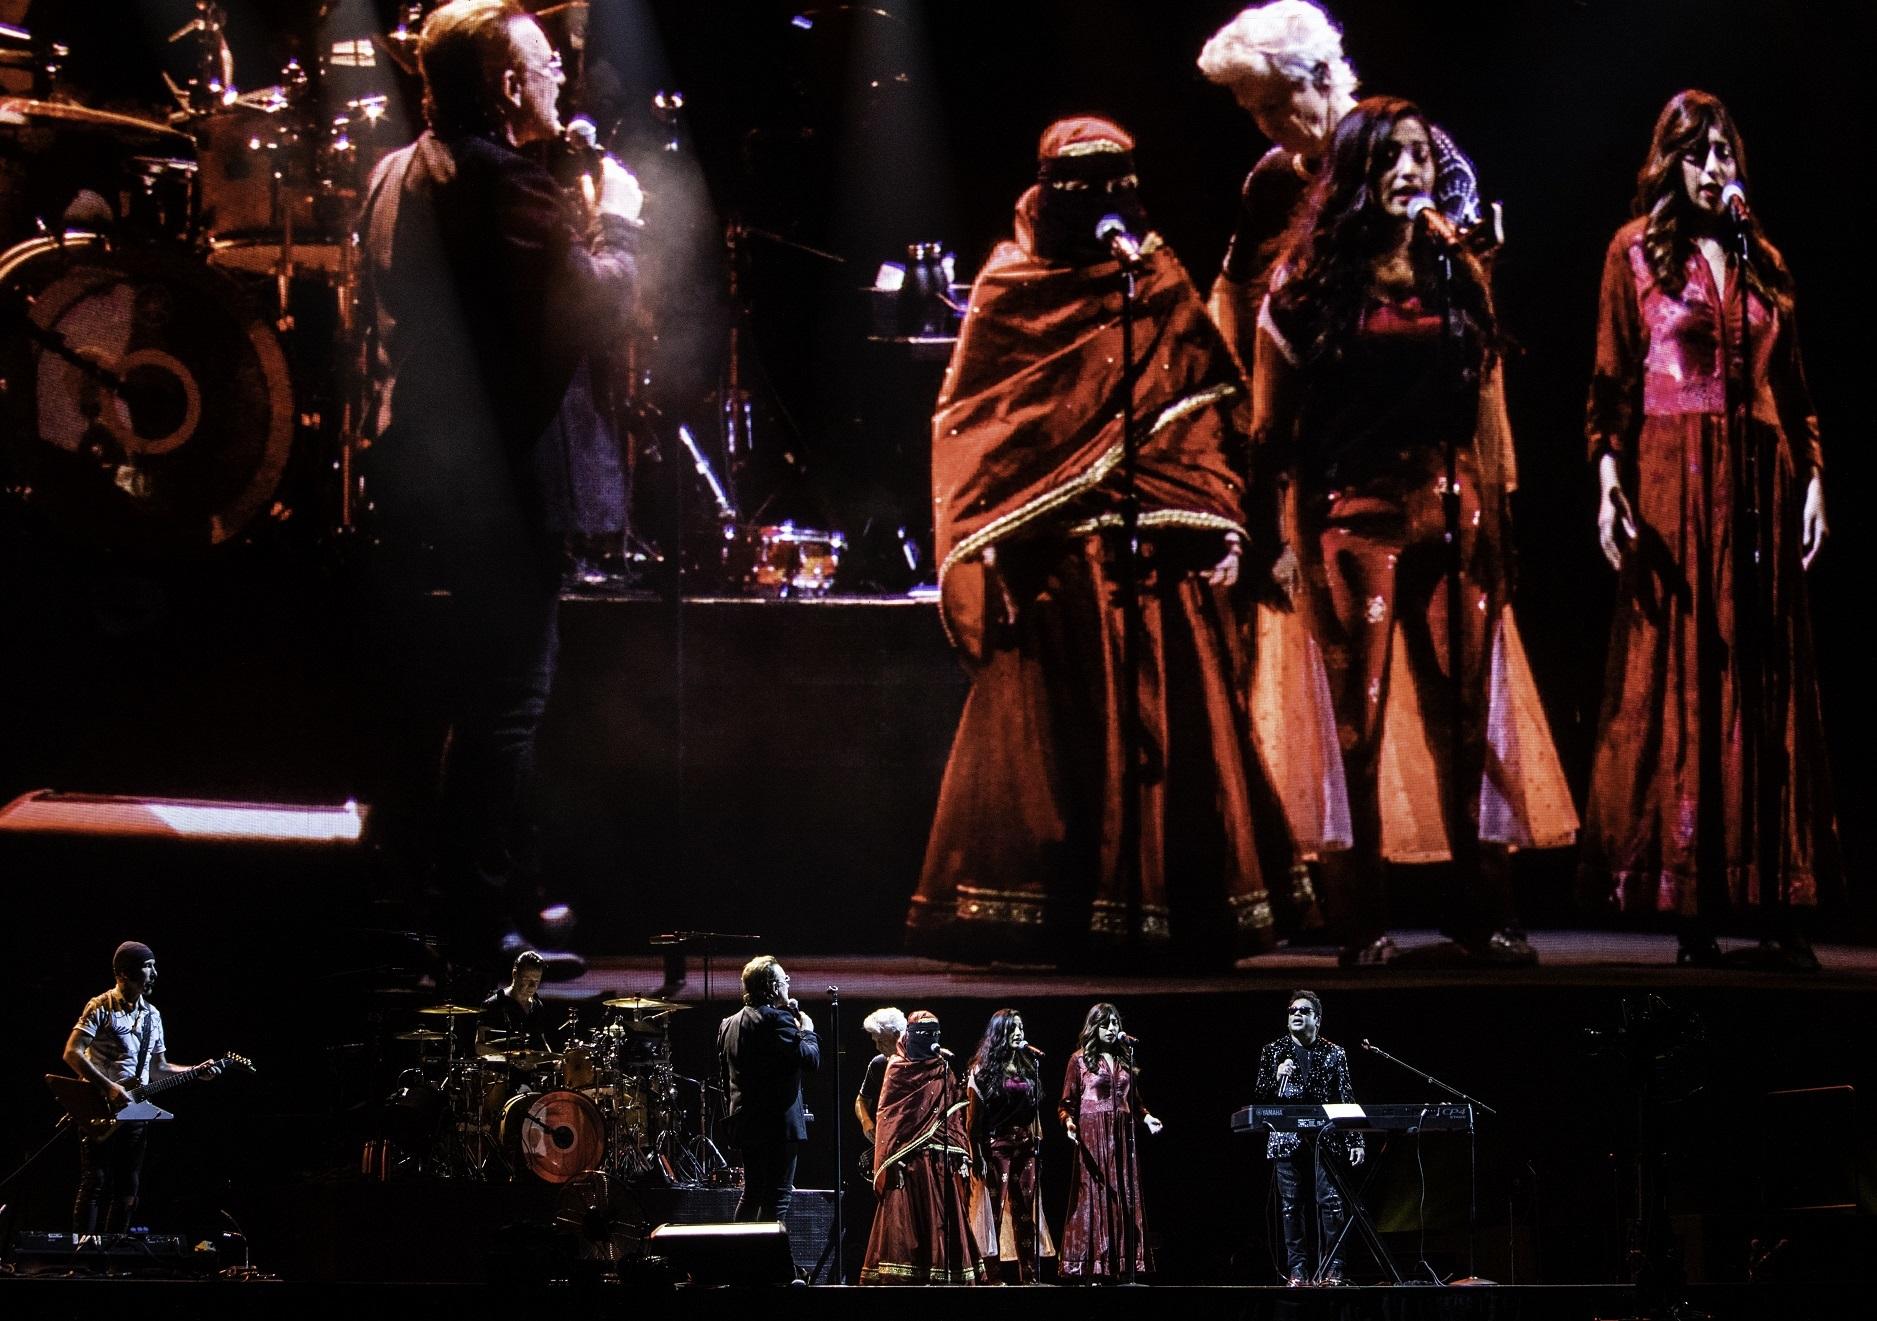 U2 & A.R. ラフマーン  PHOTO by ROSS STEWART